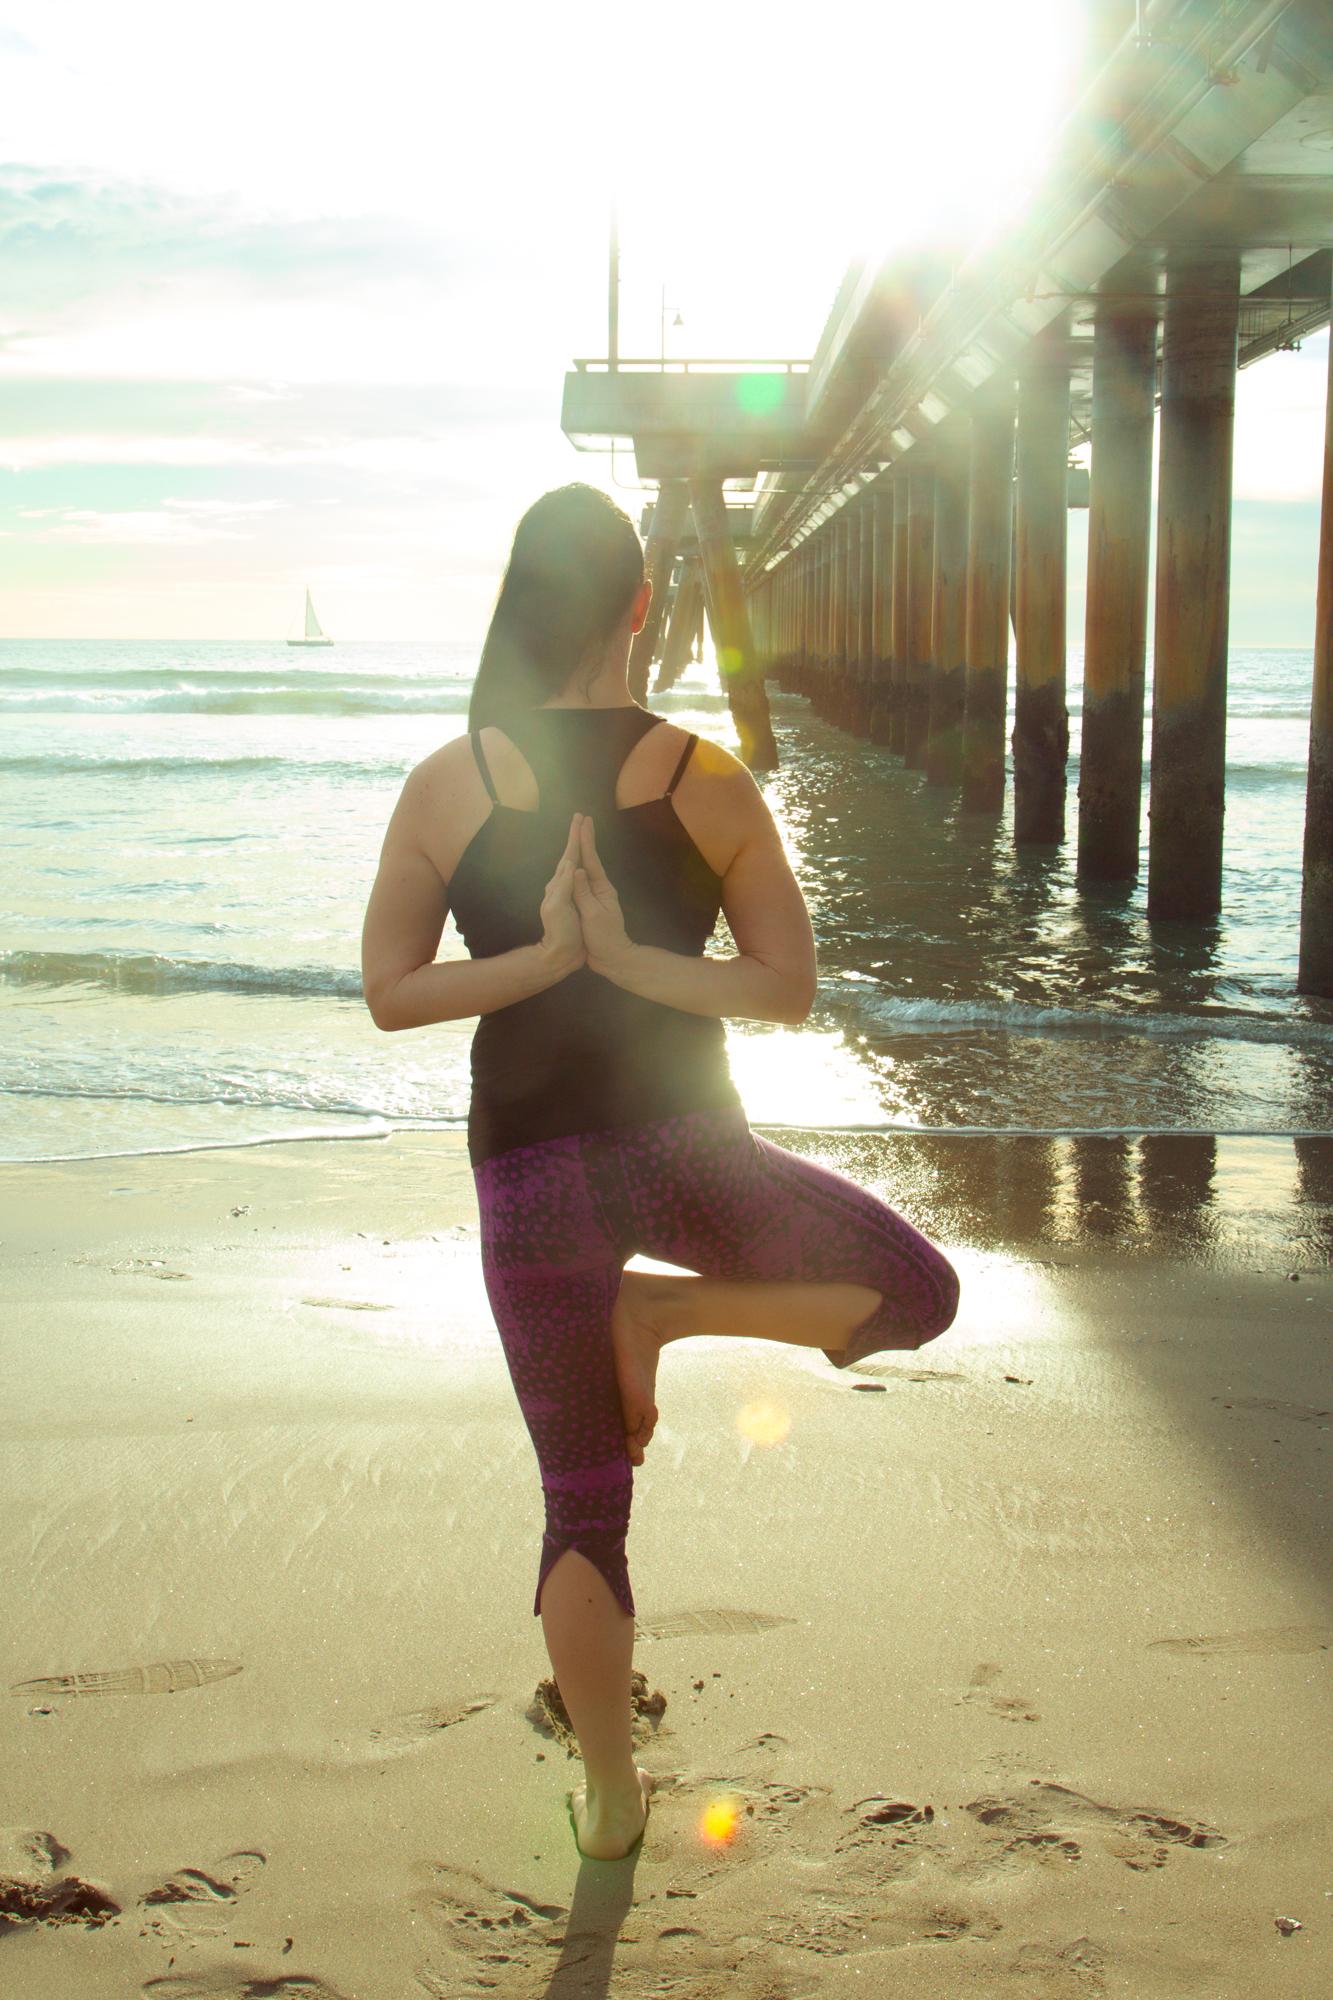 Starla yoga seasion 02 (26 of 84).jpg